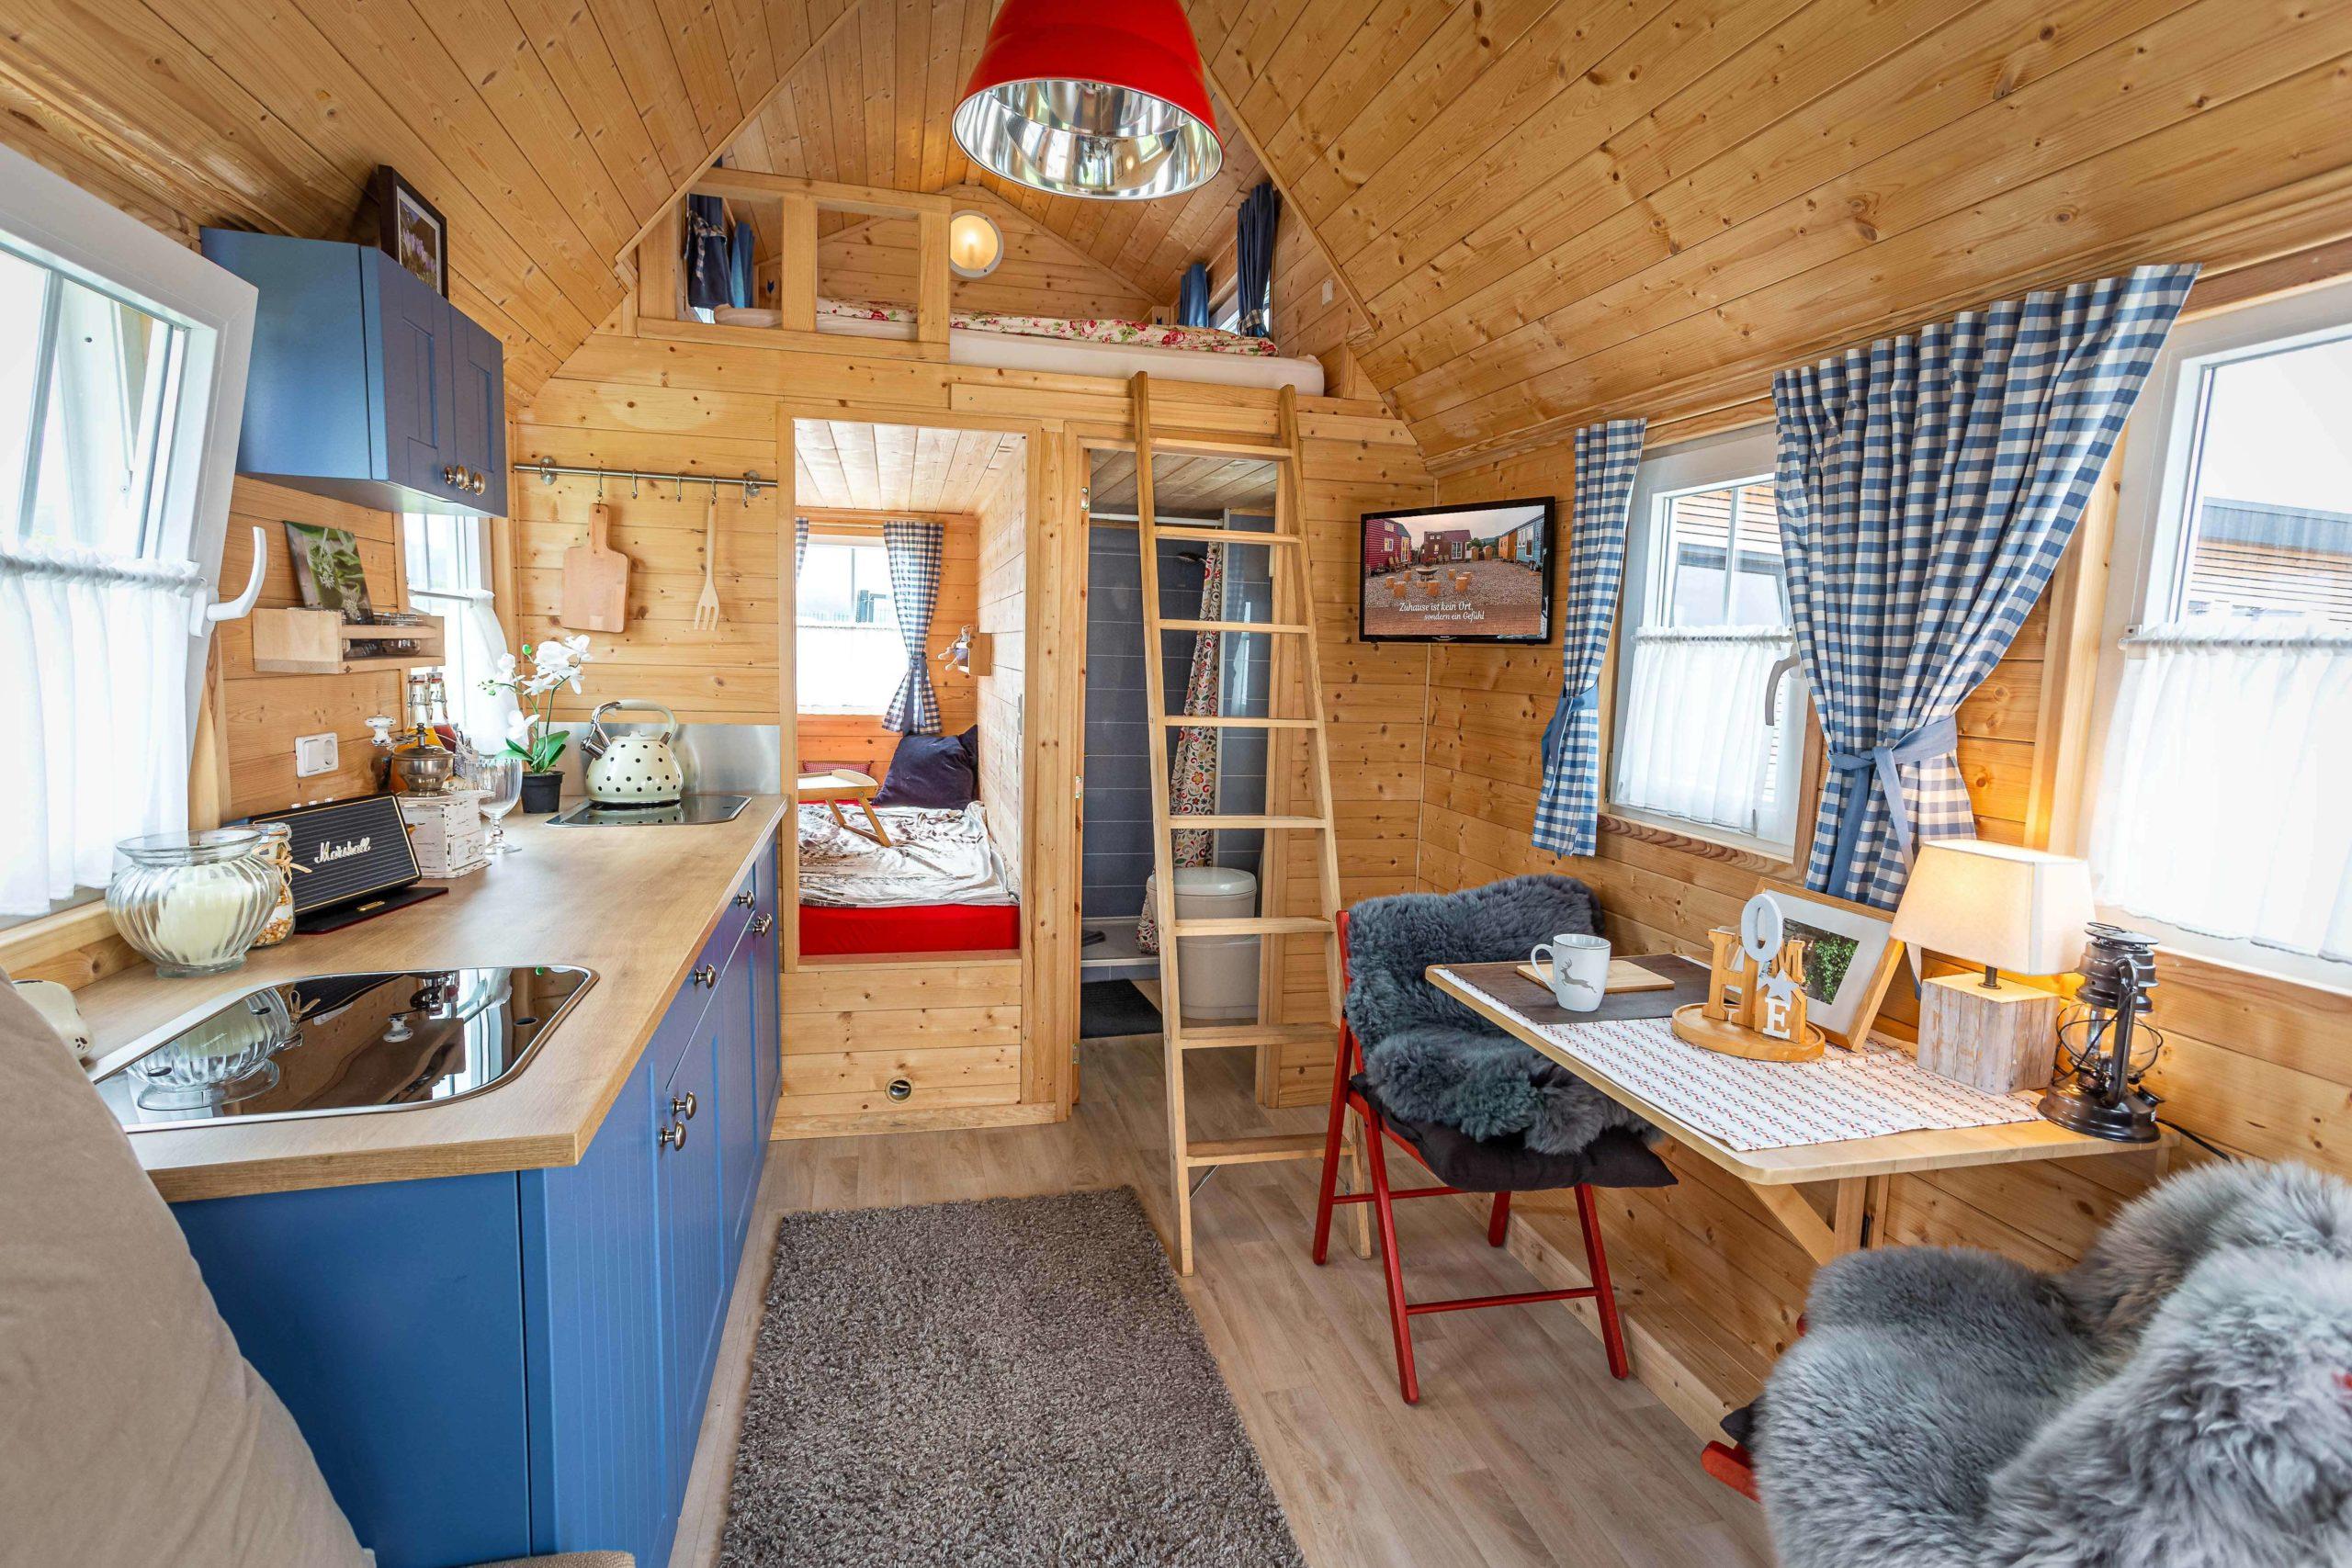 mobiles-tiny-house-island-vital-camp-gmbh-14